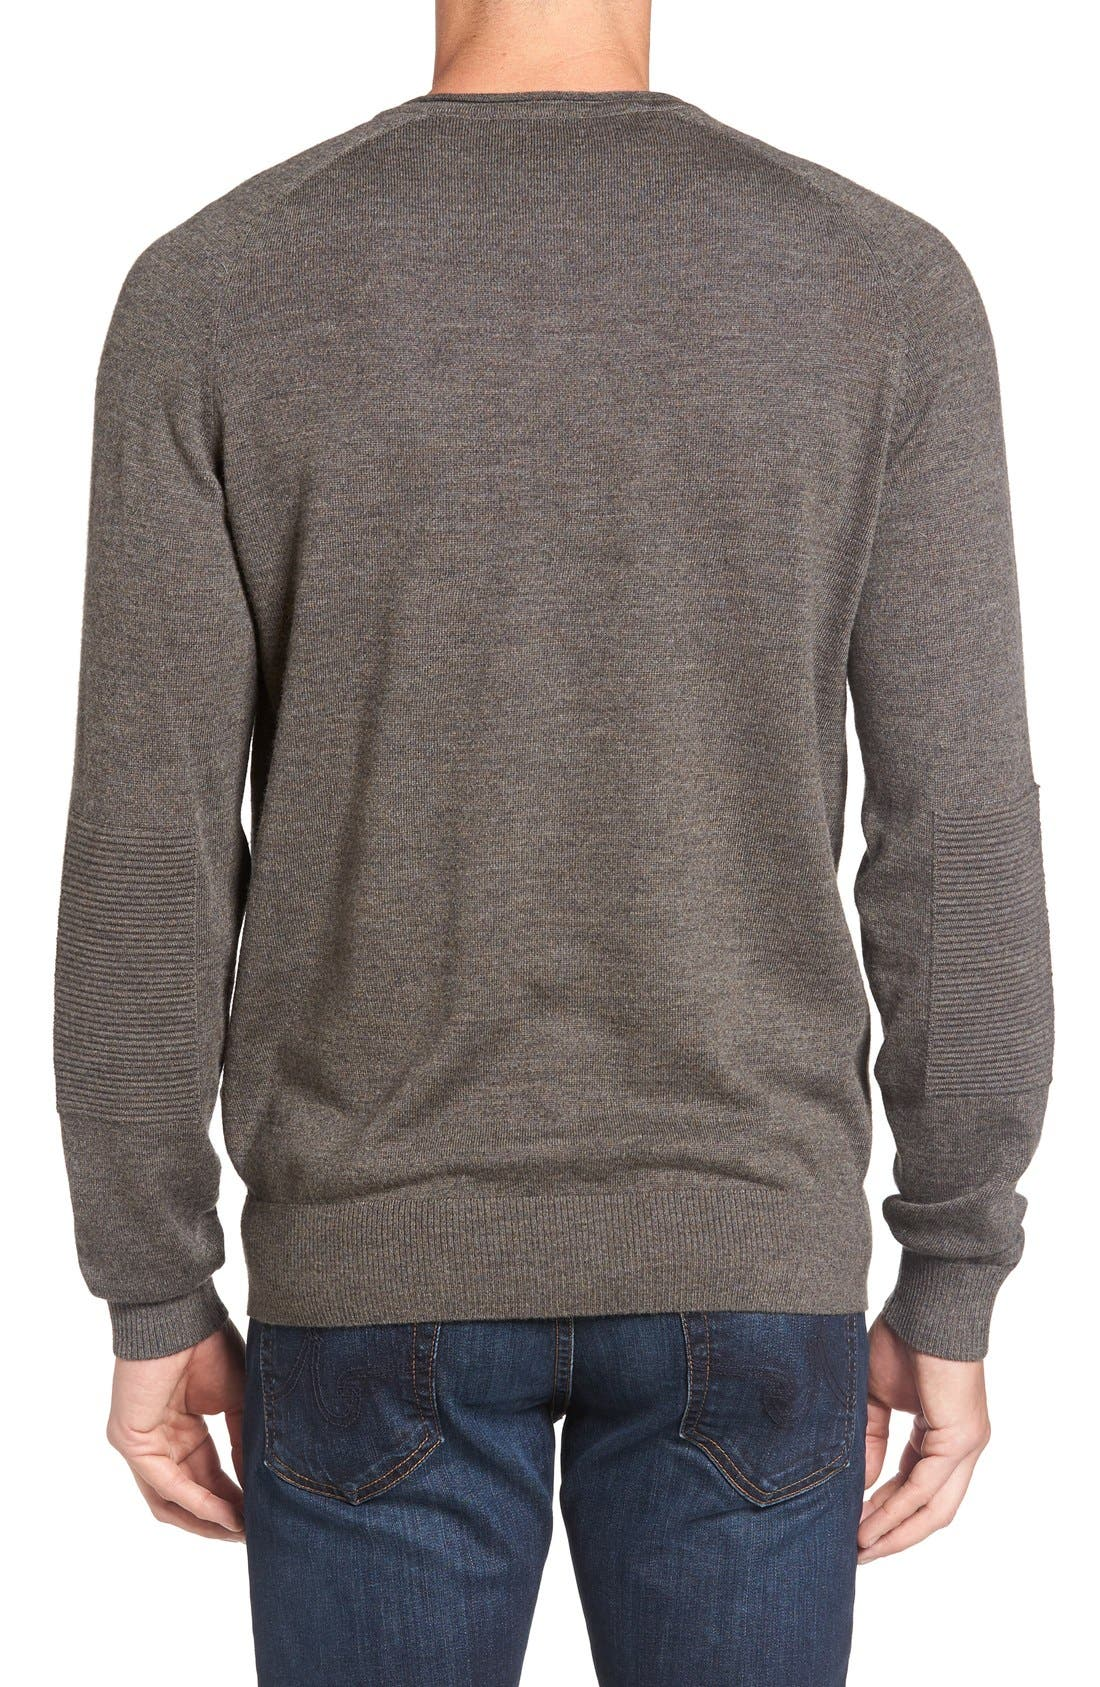 'Burwood Bay' Wool V-Neck Sweater,                             Alternate thumbnail 2, color,                             259